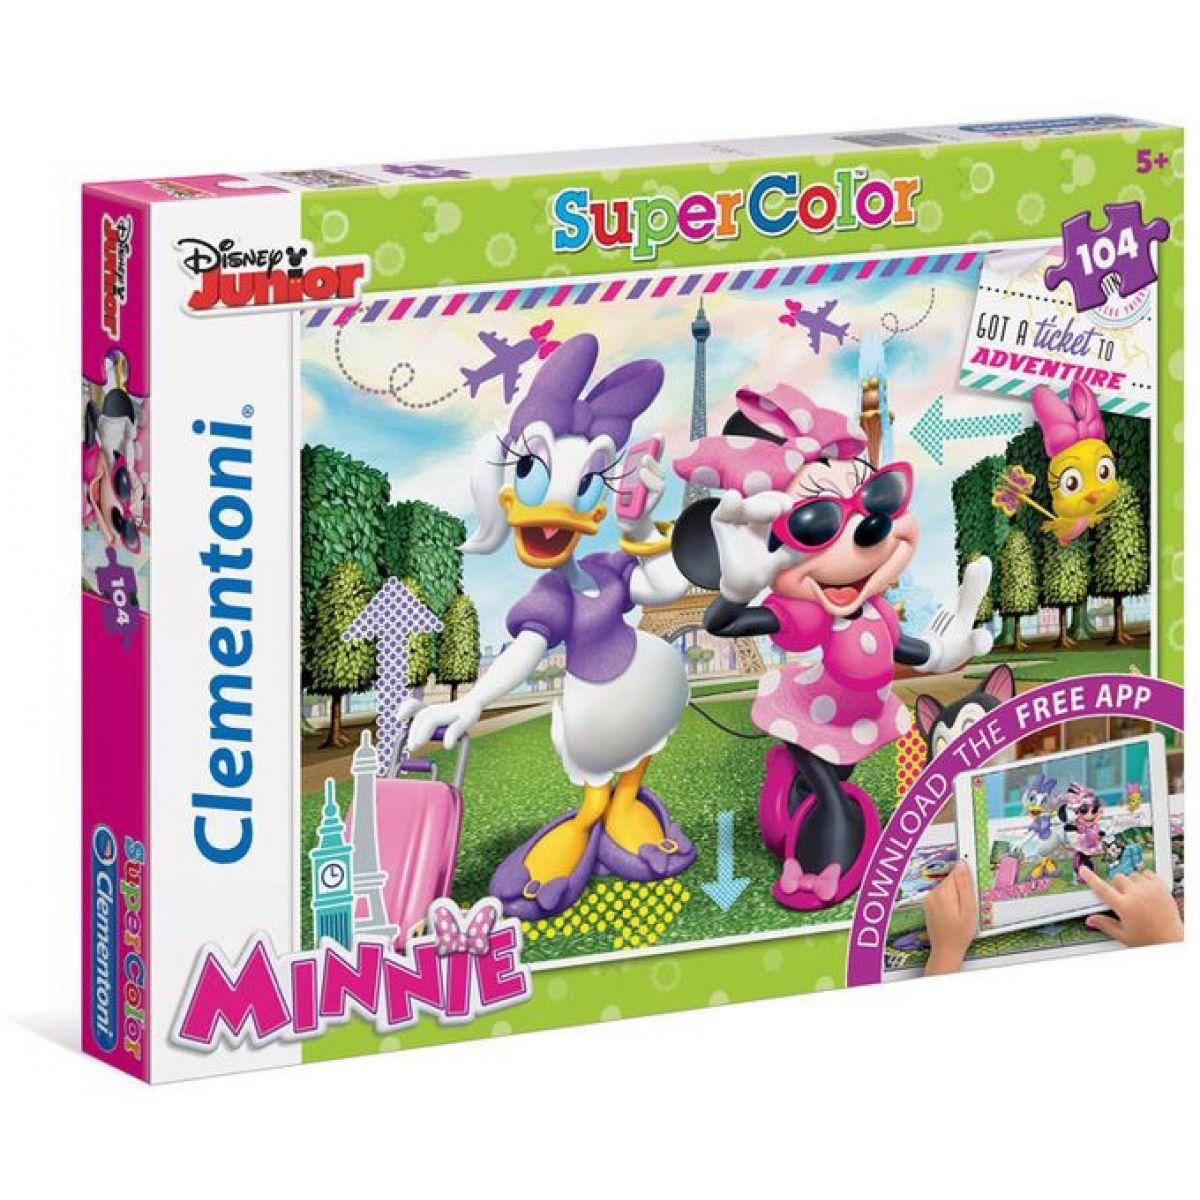 Clementoni Disney Puzzle Minnie App Supercolor 104 dílků